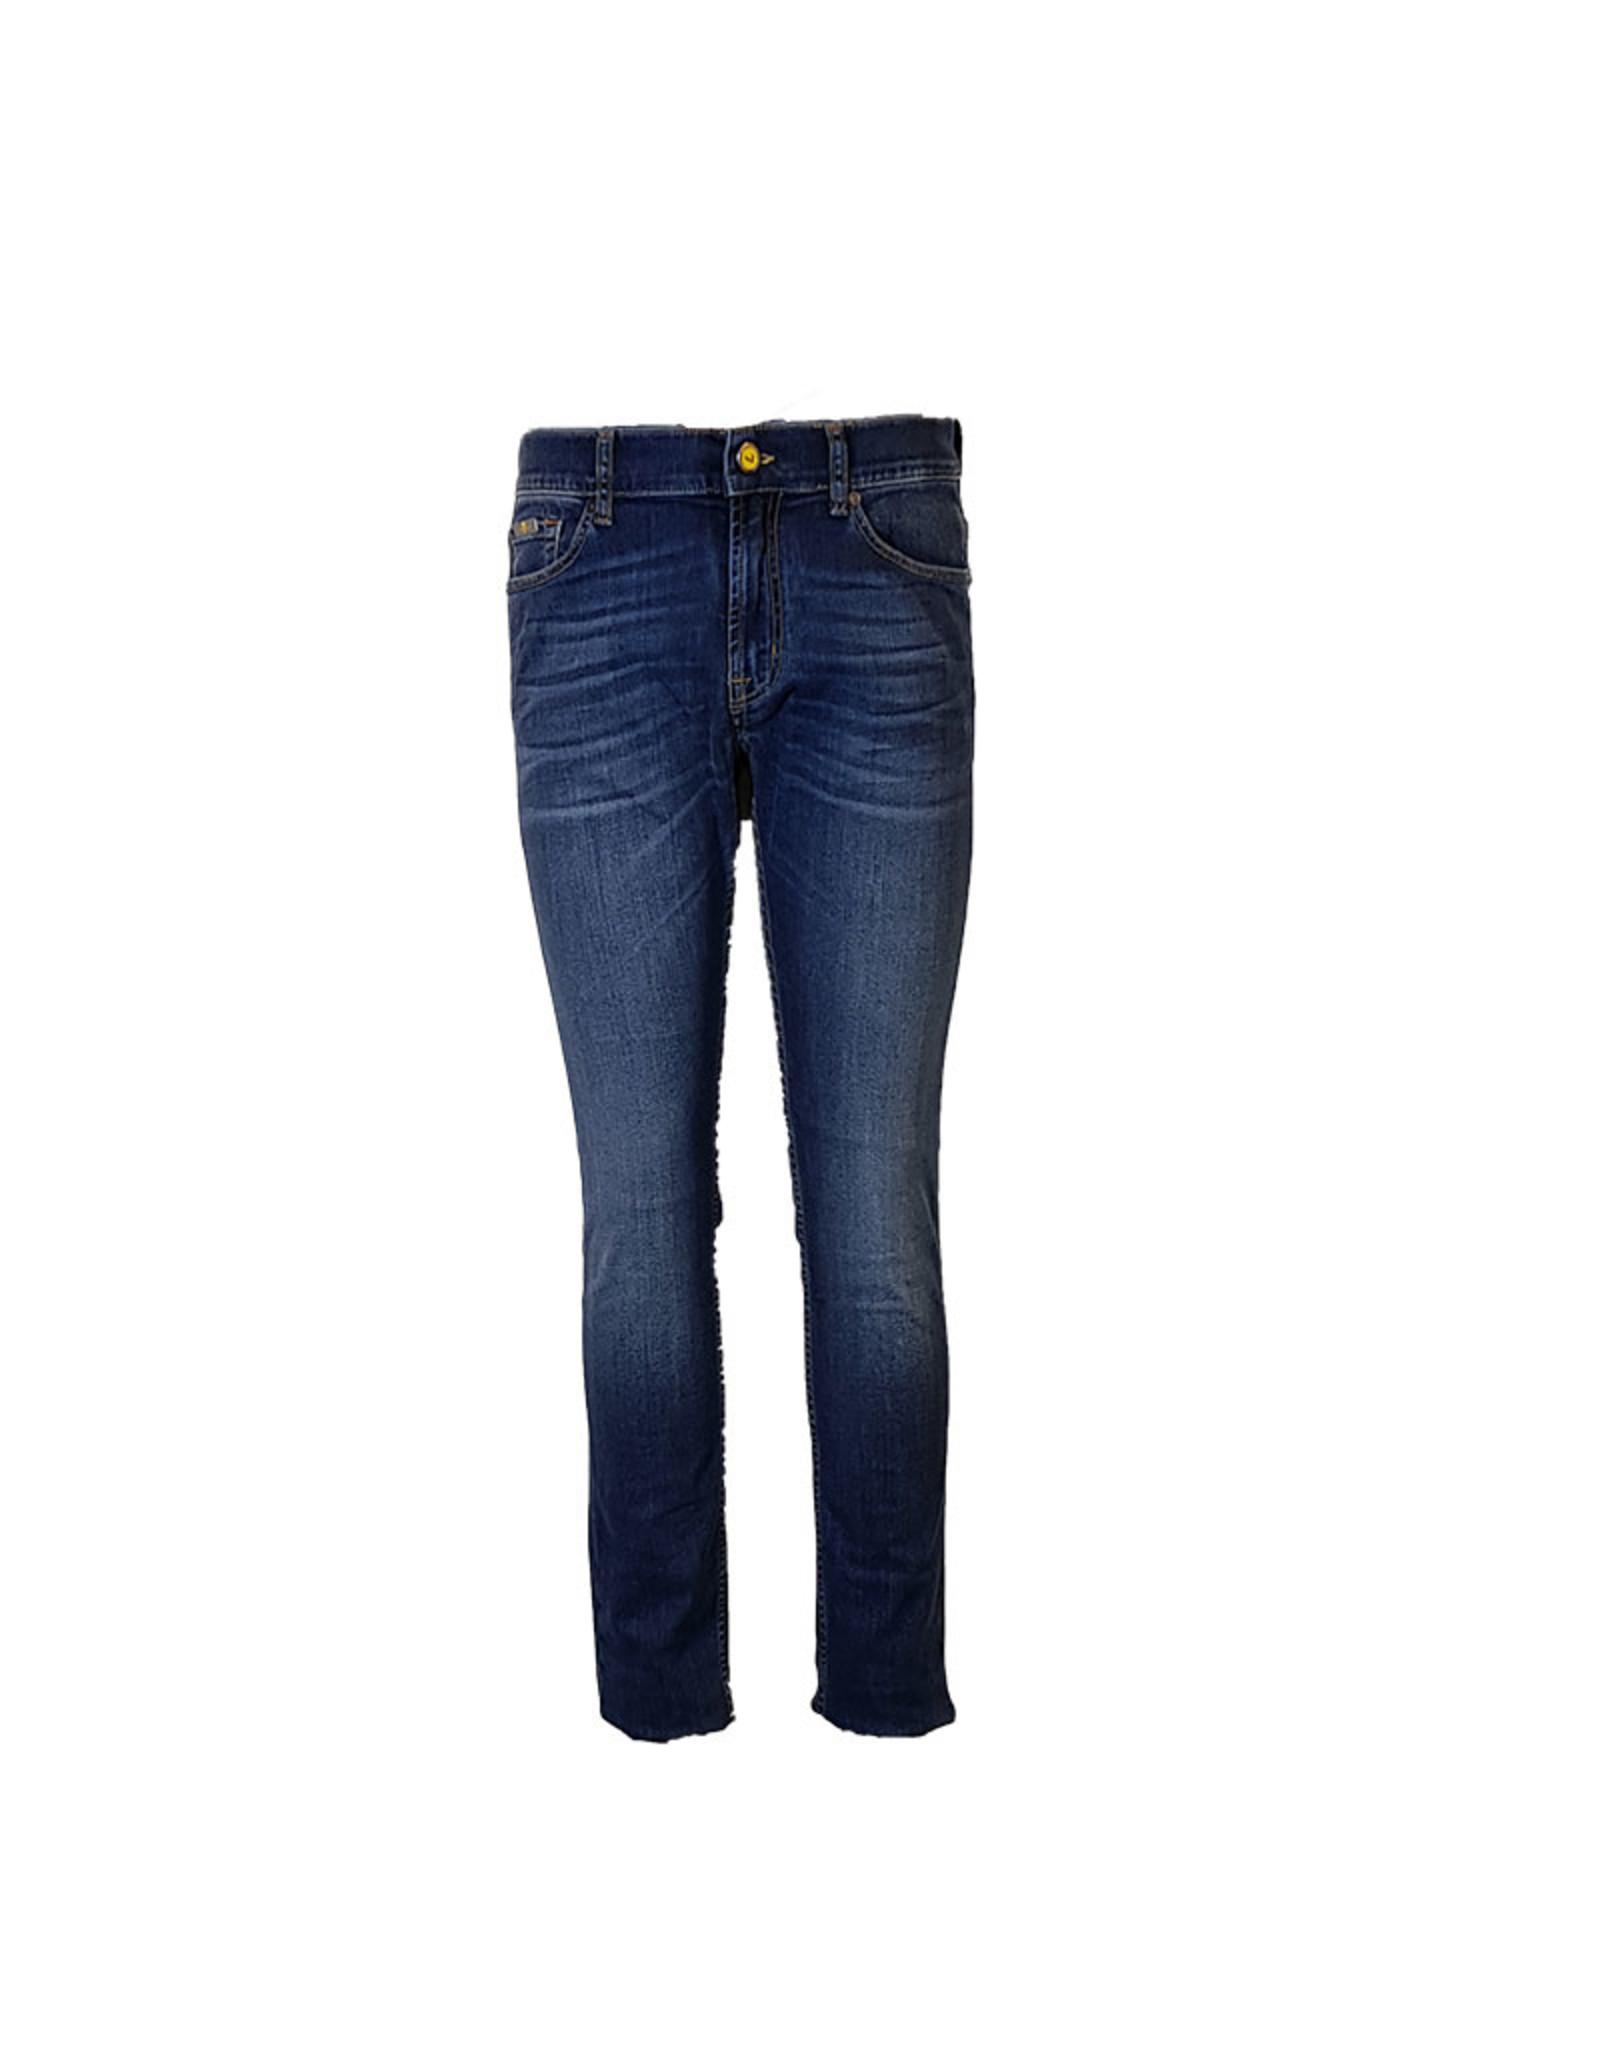 7 For All Mankind 7FAM jeans blauw Ronnie JSD4U25EKZ